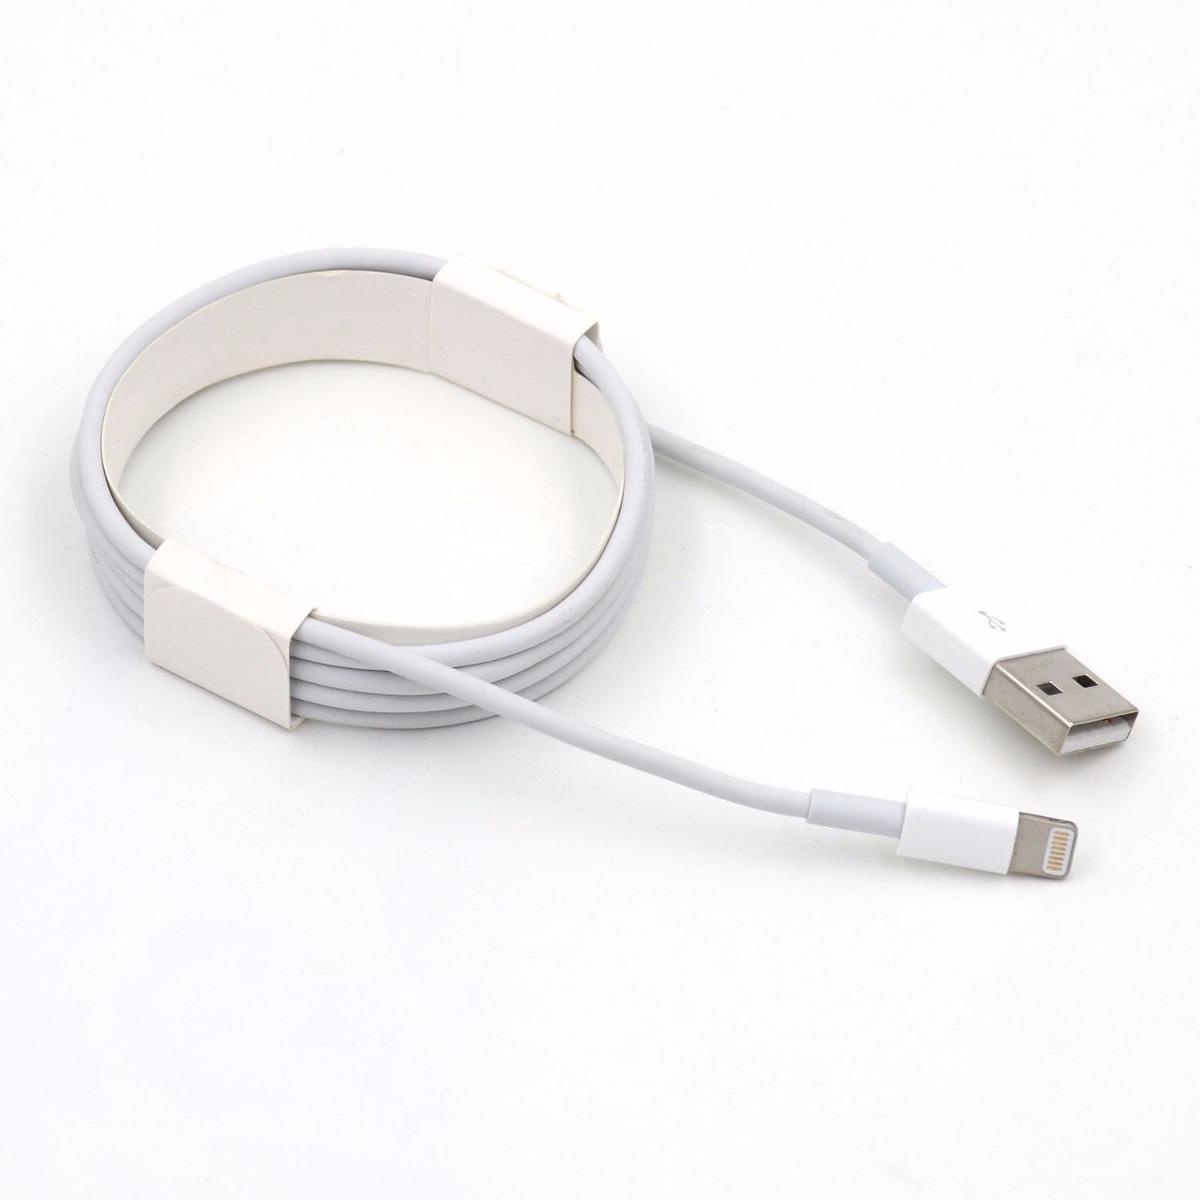 cable cargador usb original iphone 5 5s 5c 6 envio gratis. Black Bedroom Furniture Sets. Home Design Ideas